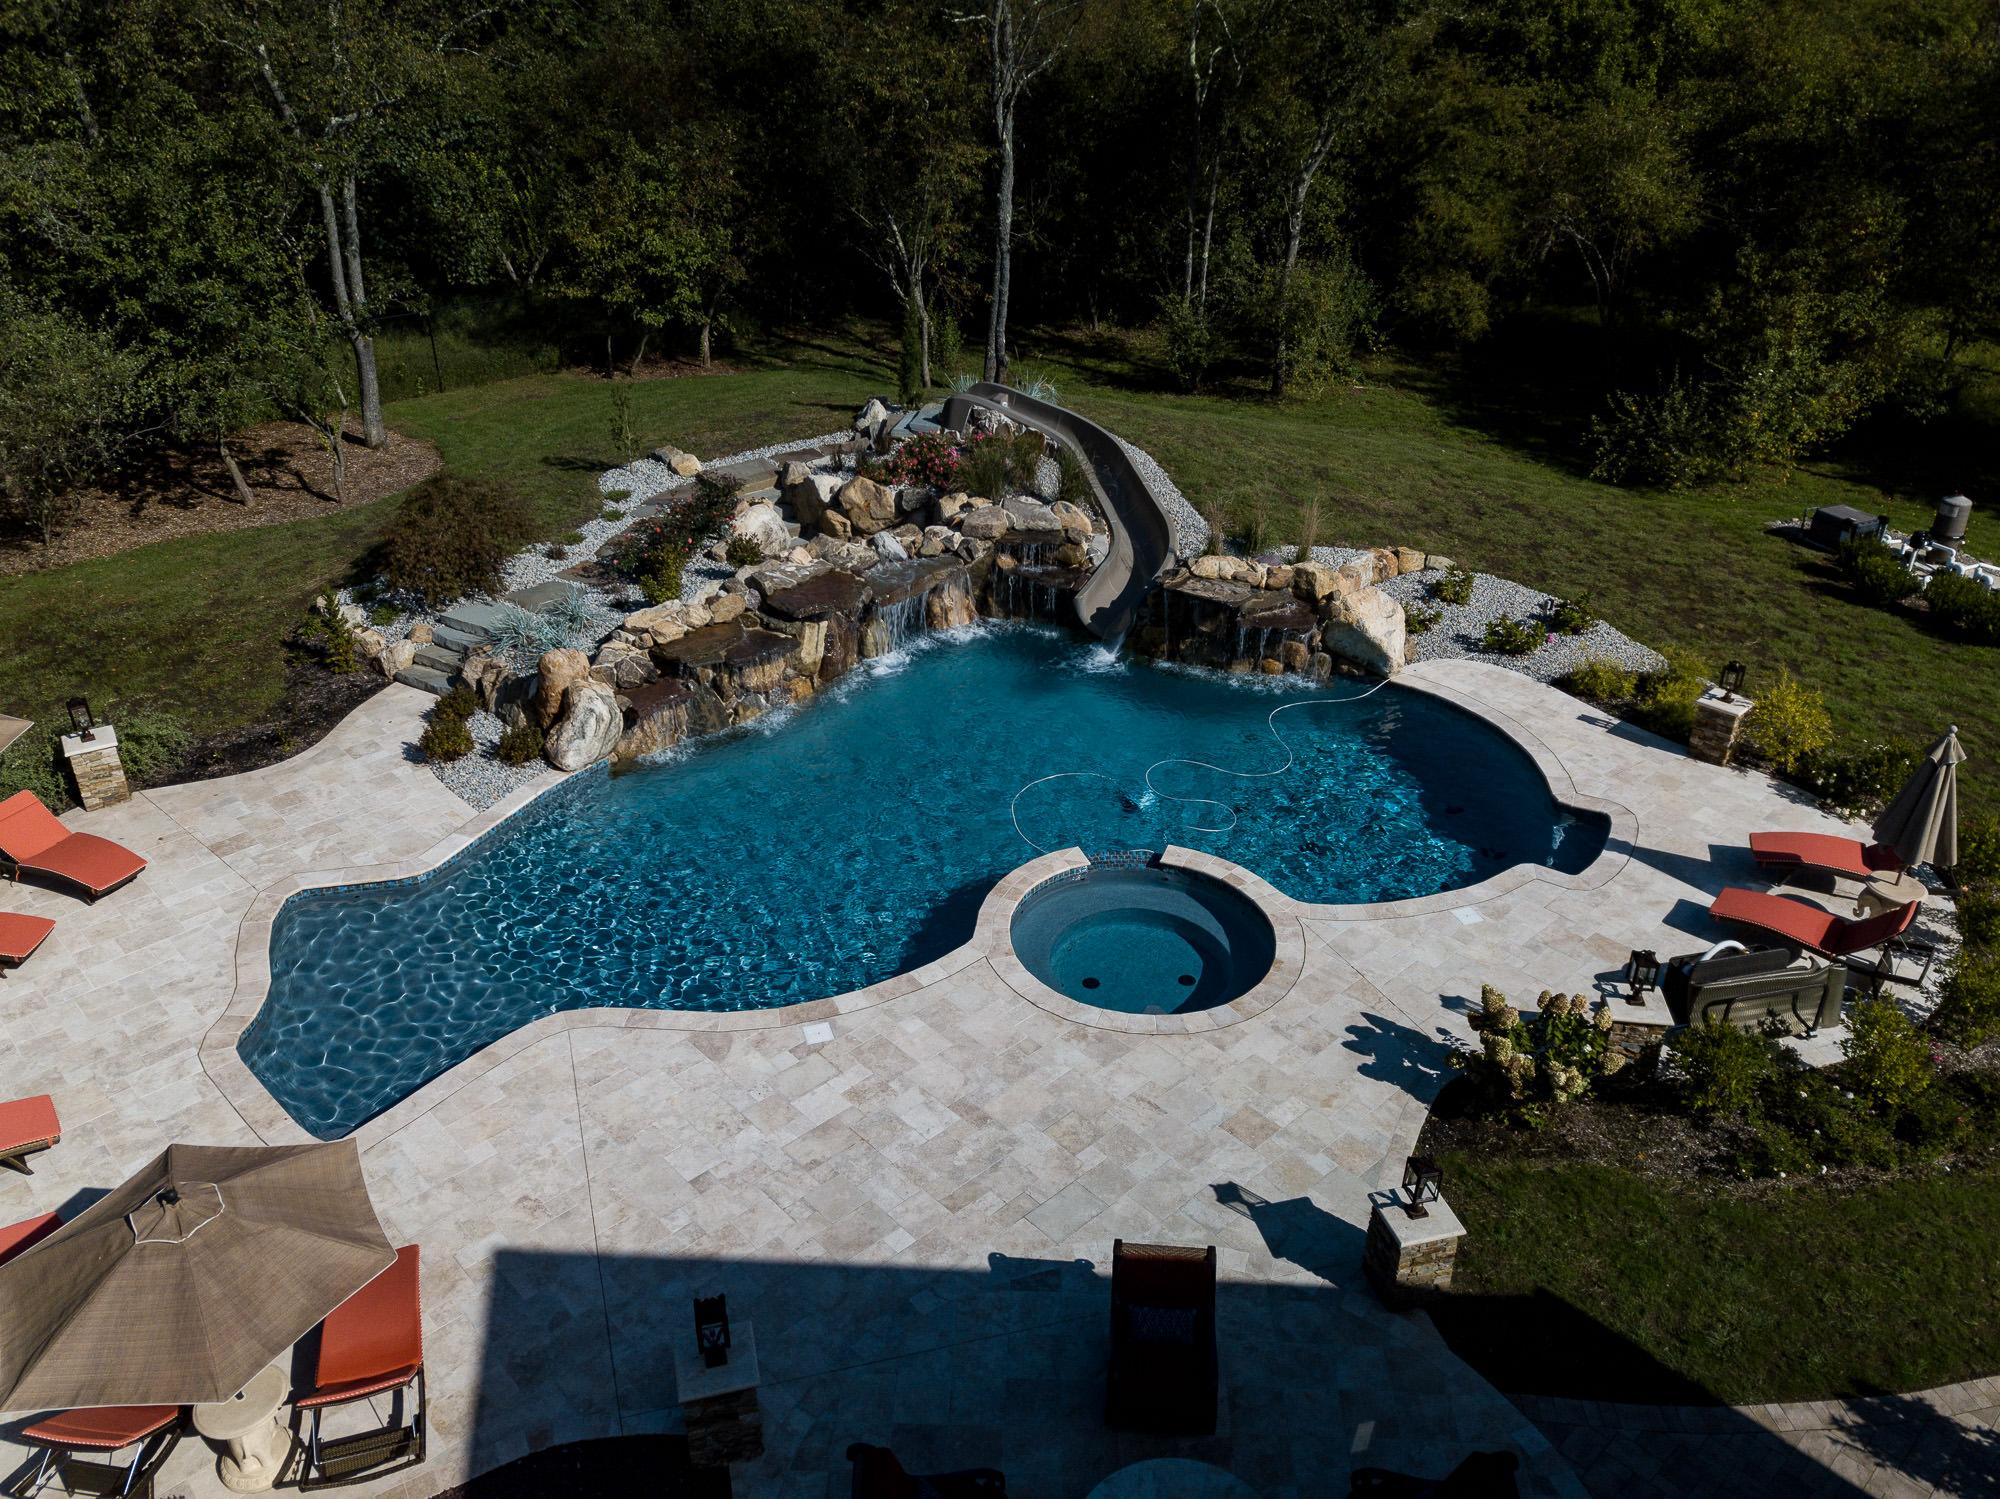 Inground Pools Pennington Nj Pools By Design New Jersey 11 Custom